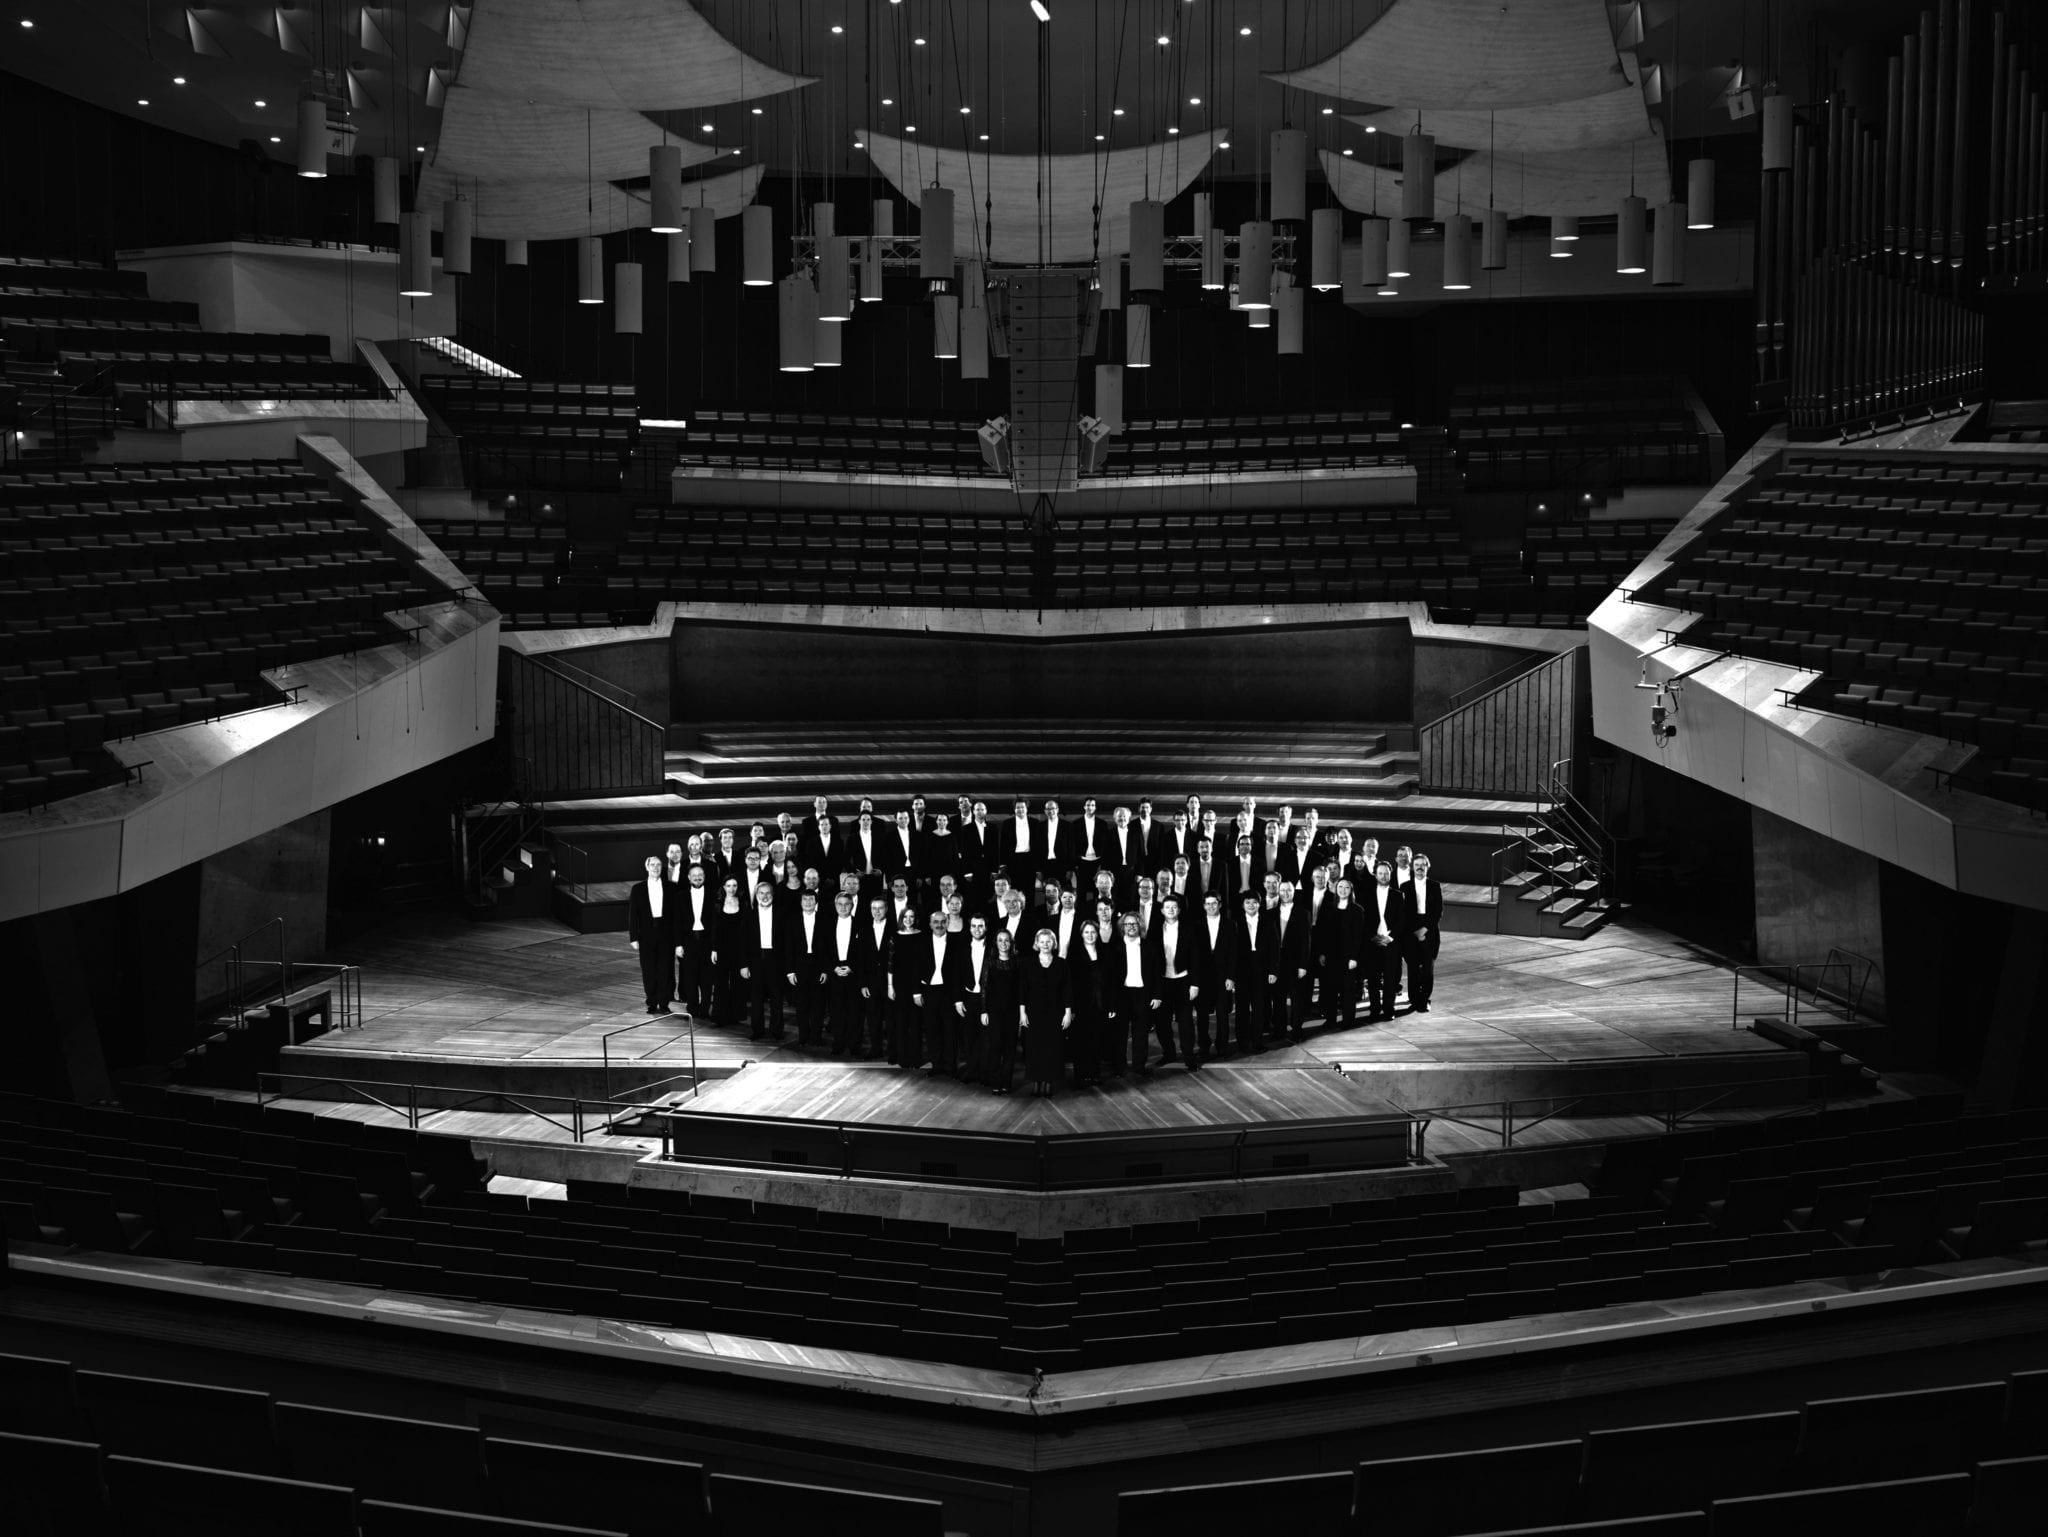 Kavlifondet støttet aktivt Berlinfilharmoniens Europakonsert i Røros kirke 1. mai 2016. Foto: Berlinfilharmonien.